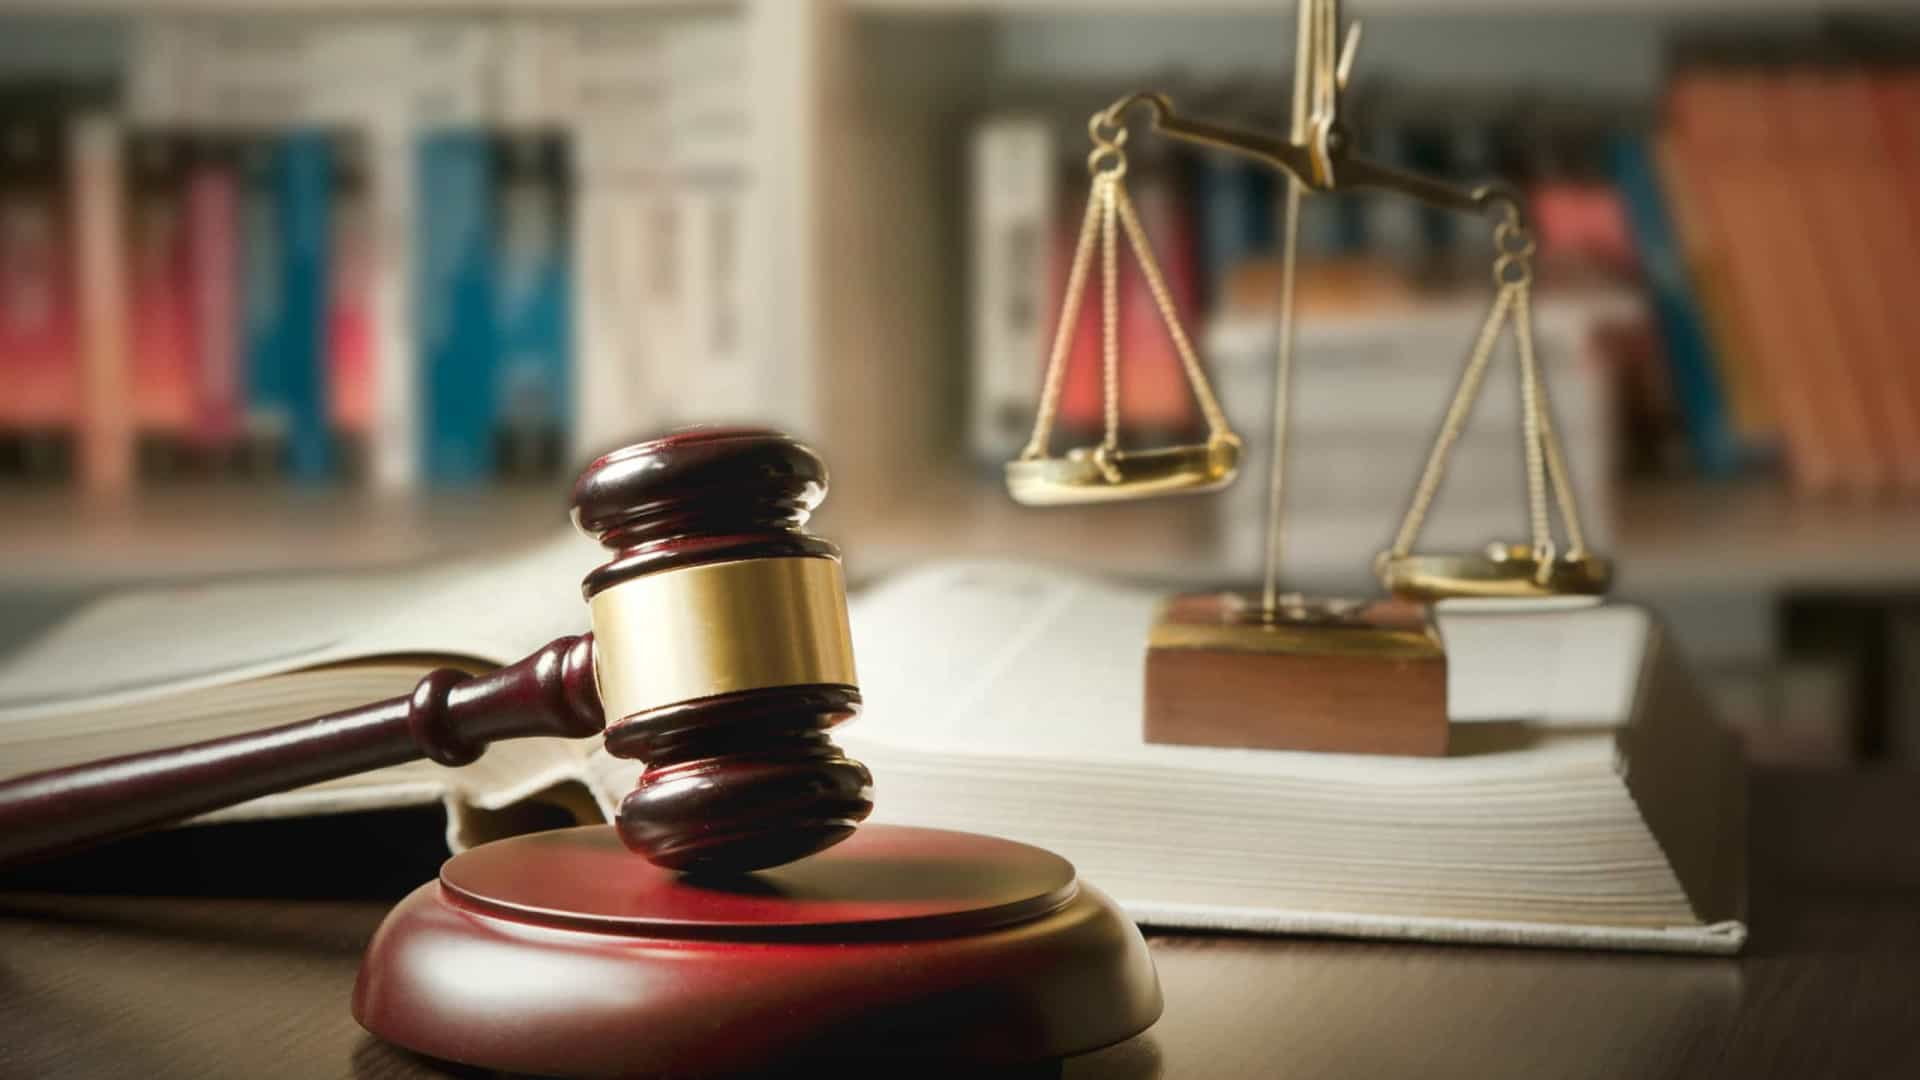 Justiça condena CEMIG por queda de energia em festa de debutante